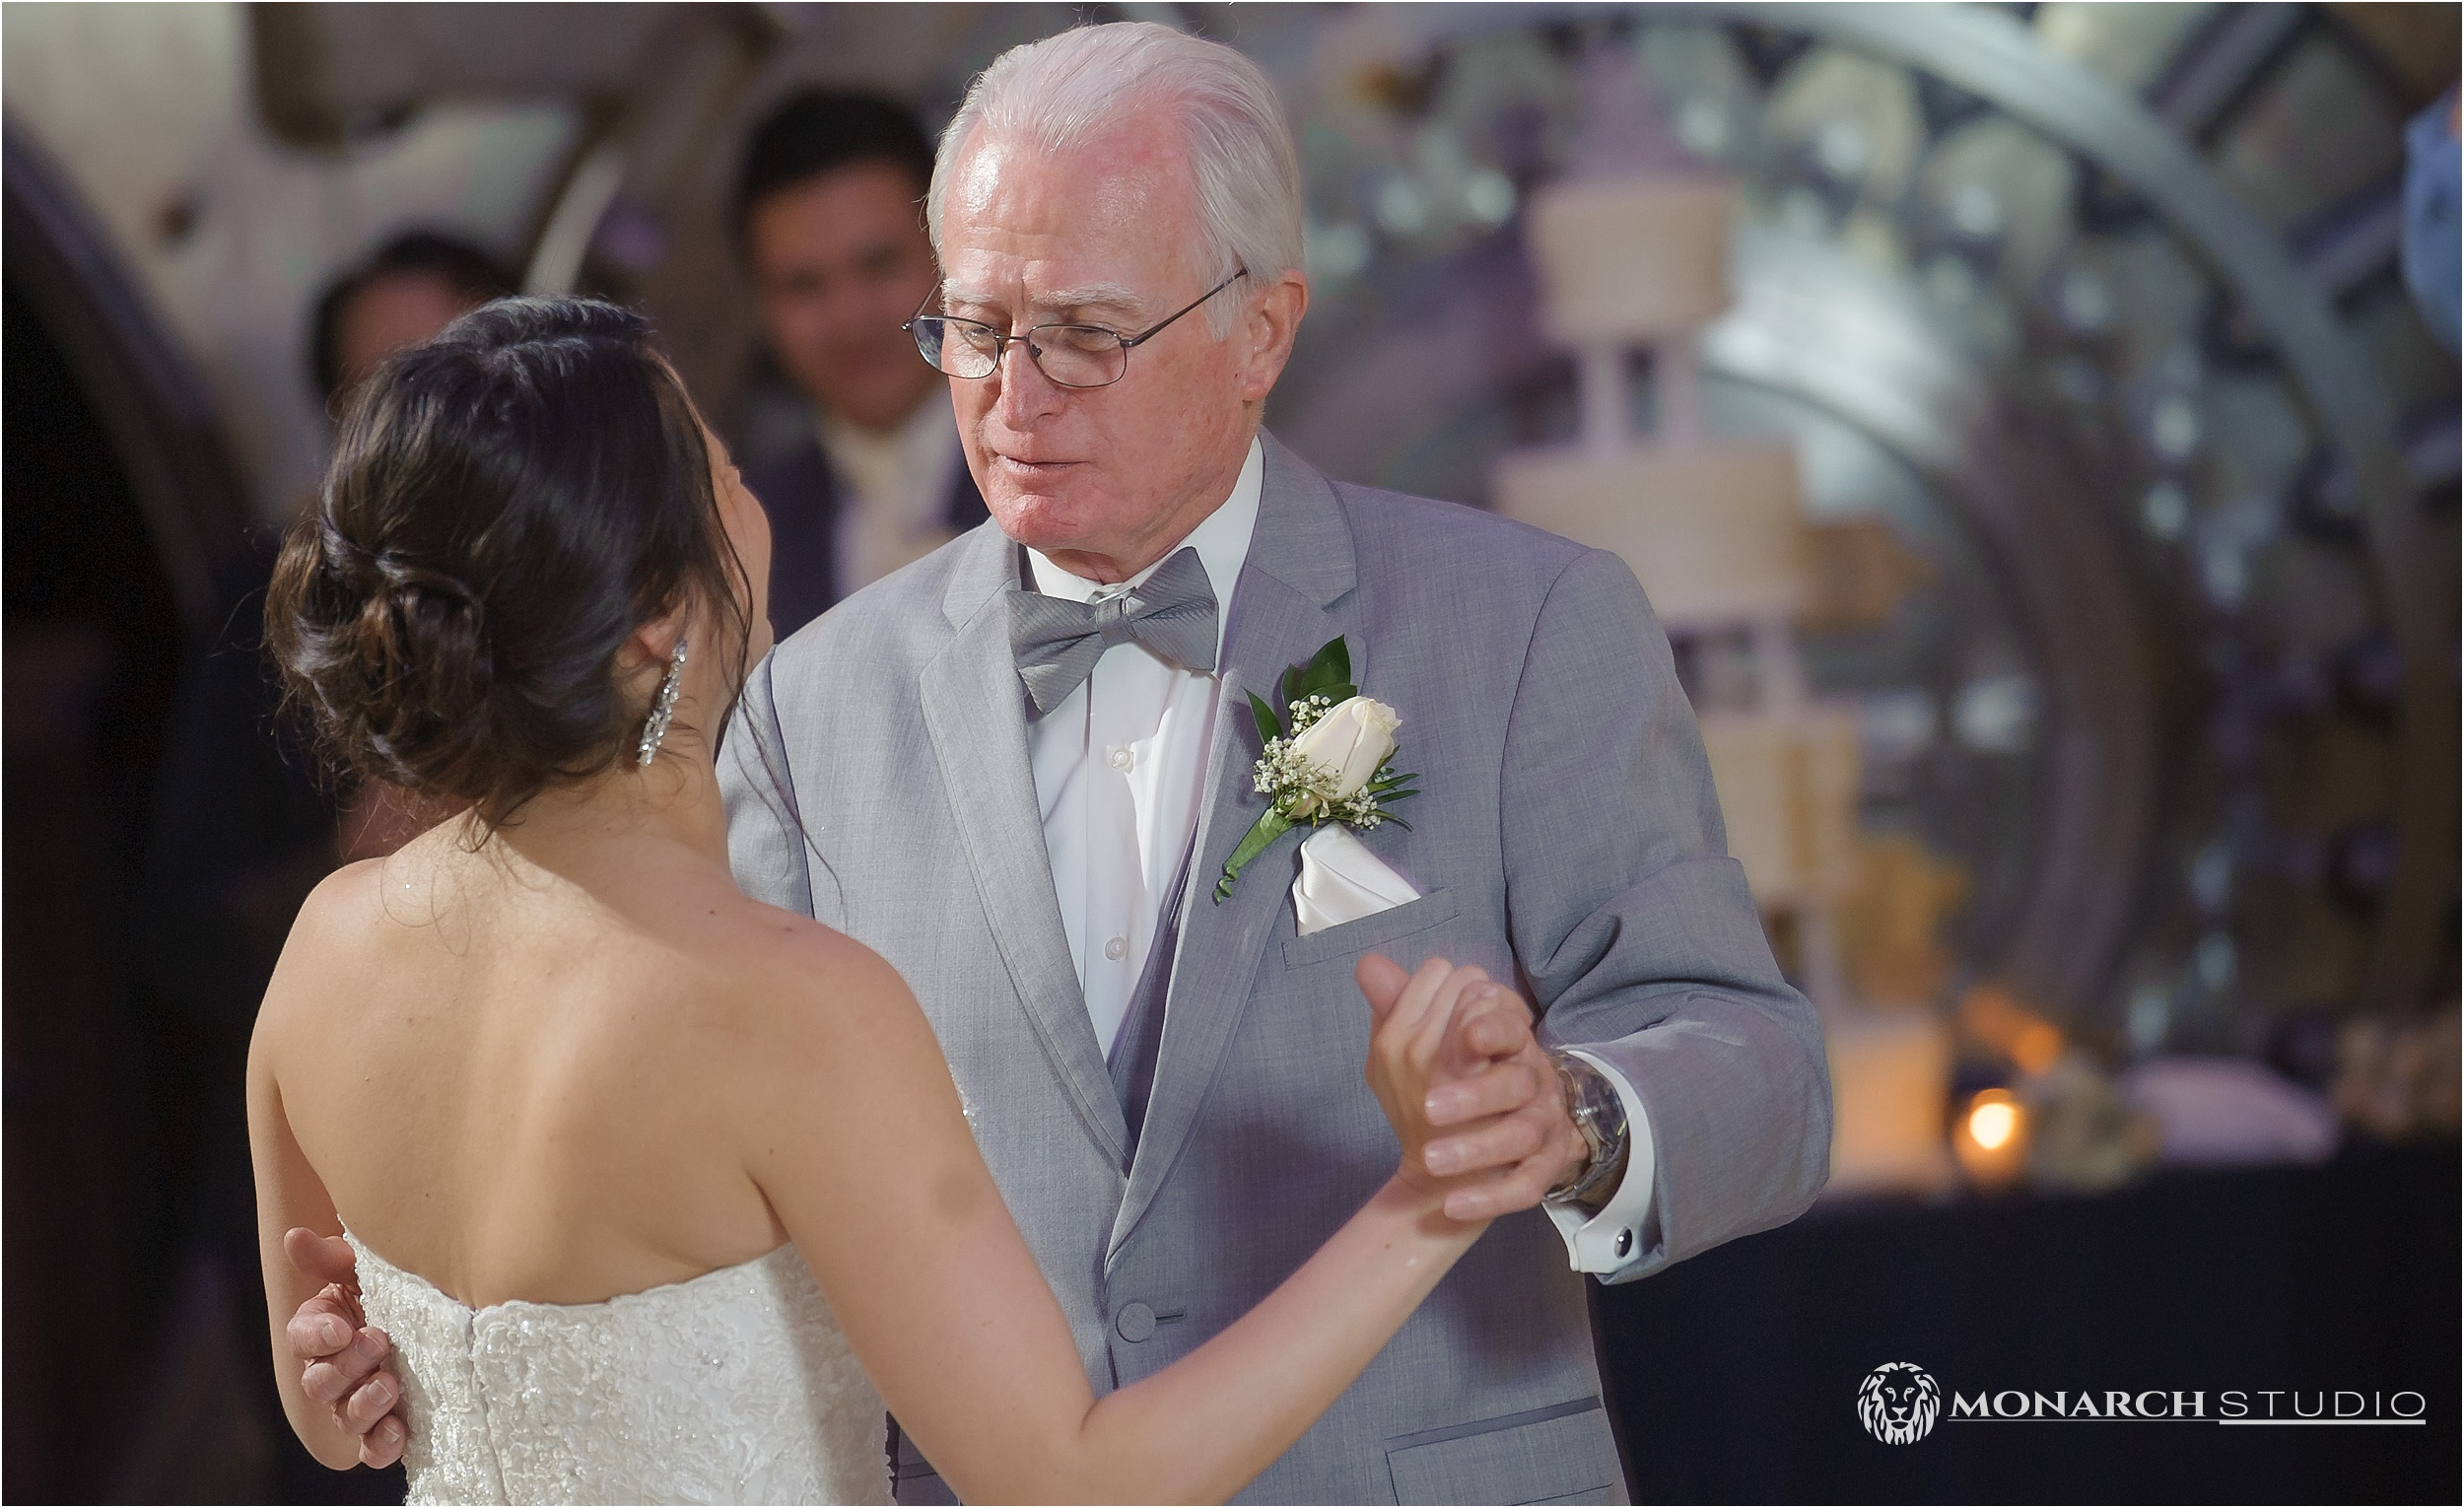 wedding-photographer-in-st-augustine-florida-treasury-102.jpg